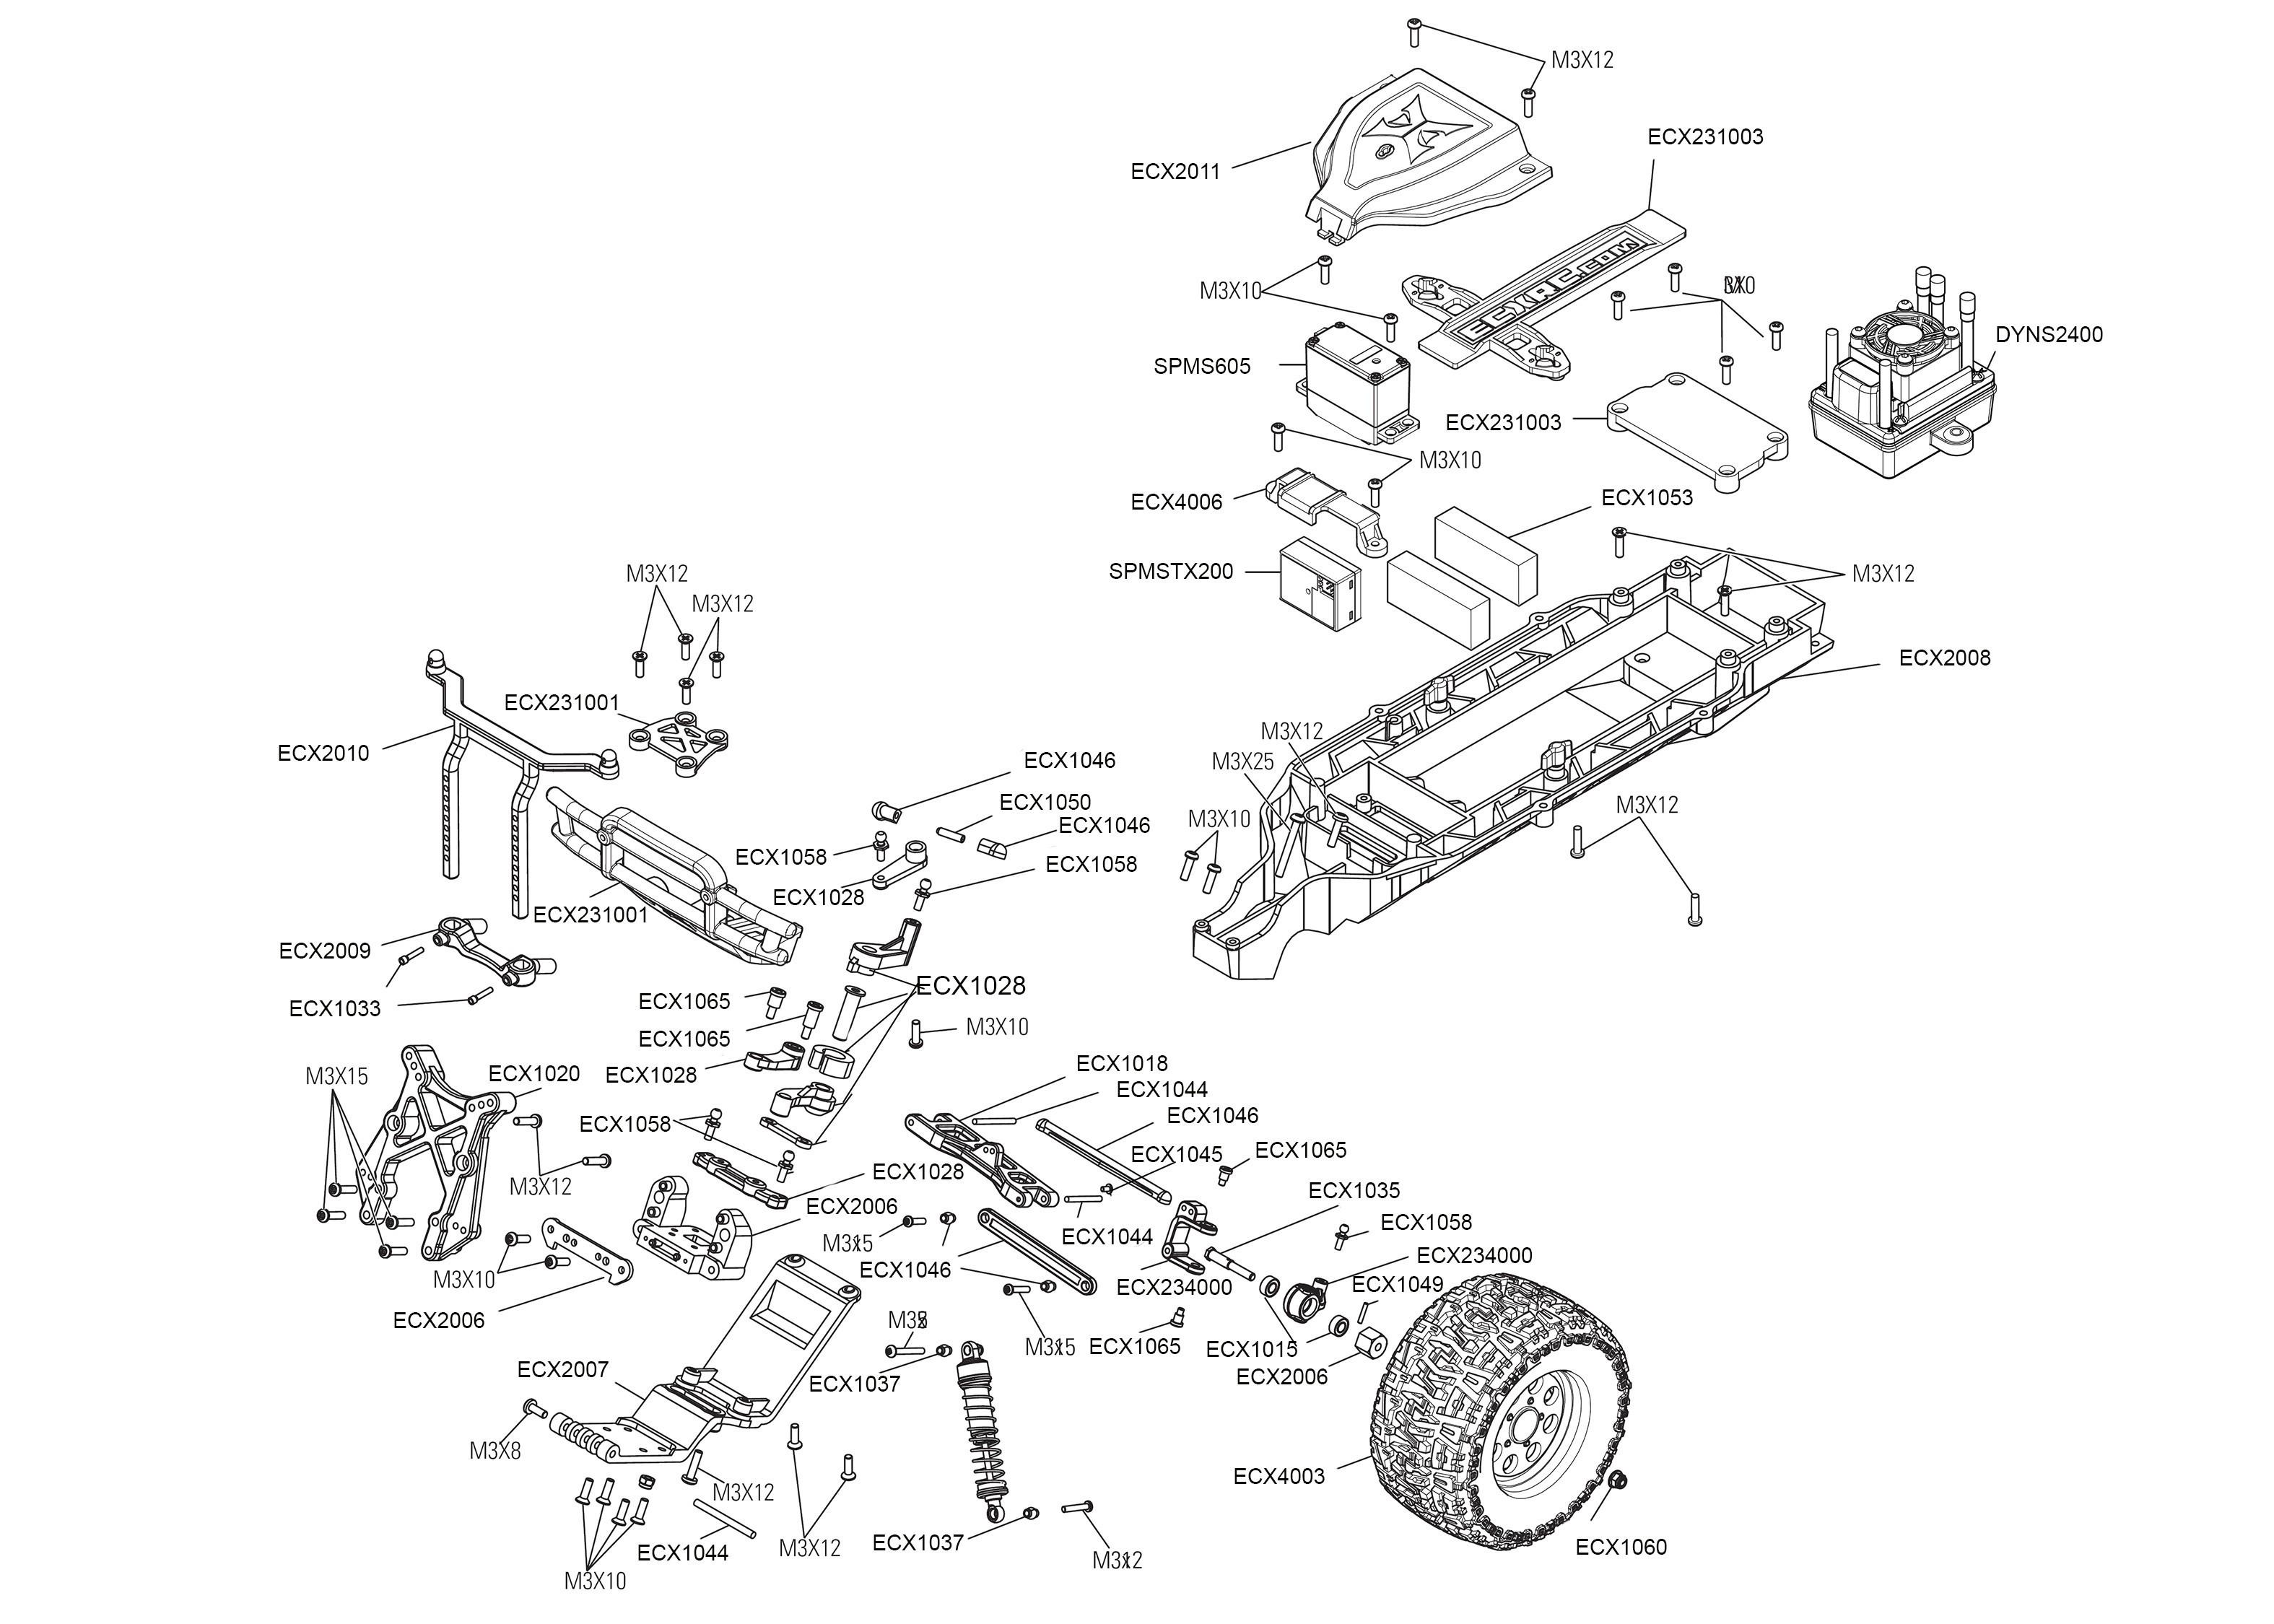 Honda Civic Engine Parts Diagram Engine Parts Diagram with Dimensions Best 20 Nissan Usa Parts – My Of Honda Civic Engine Parts Diagram